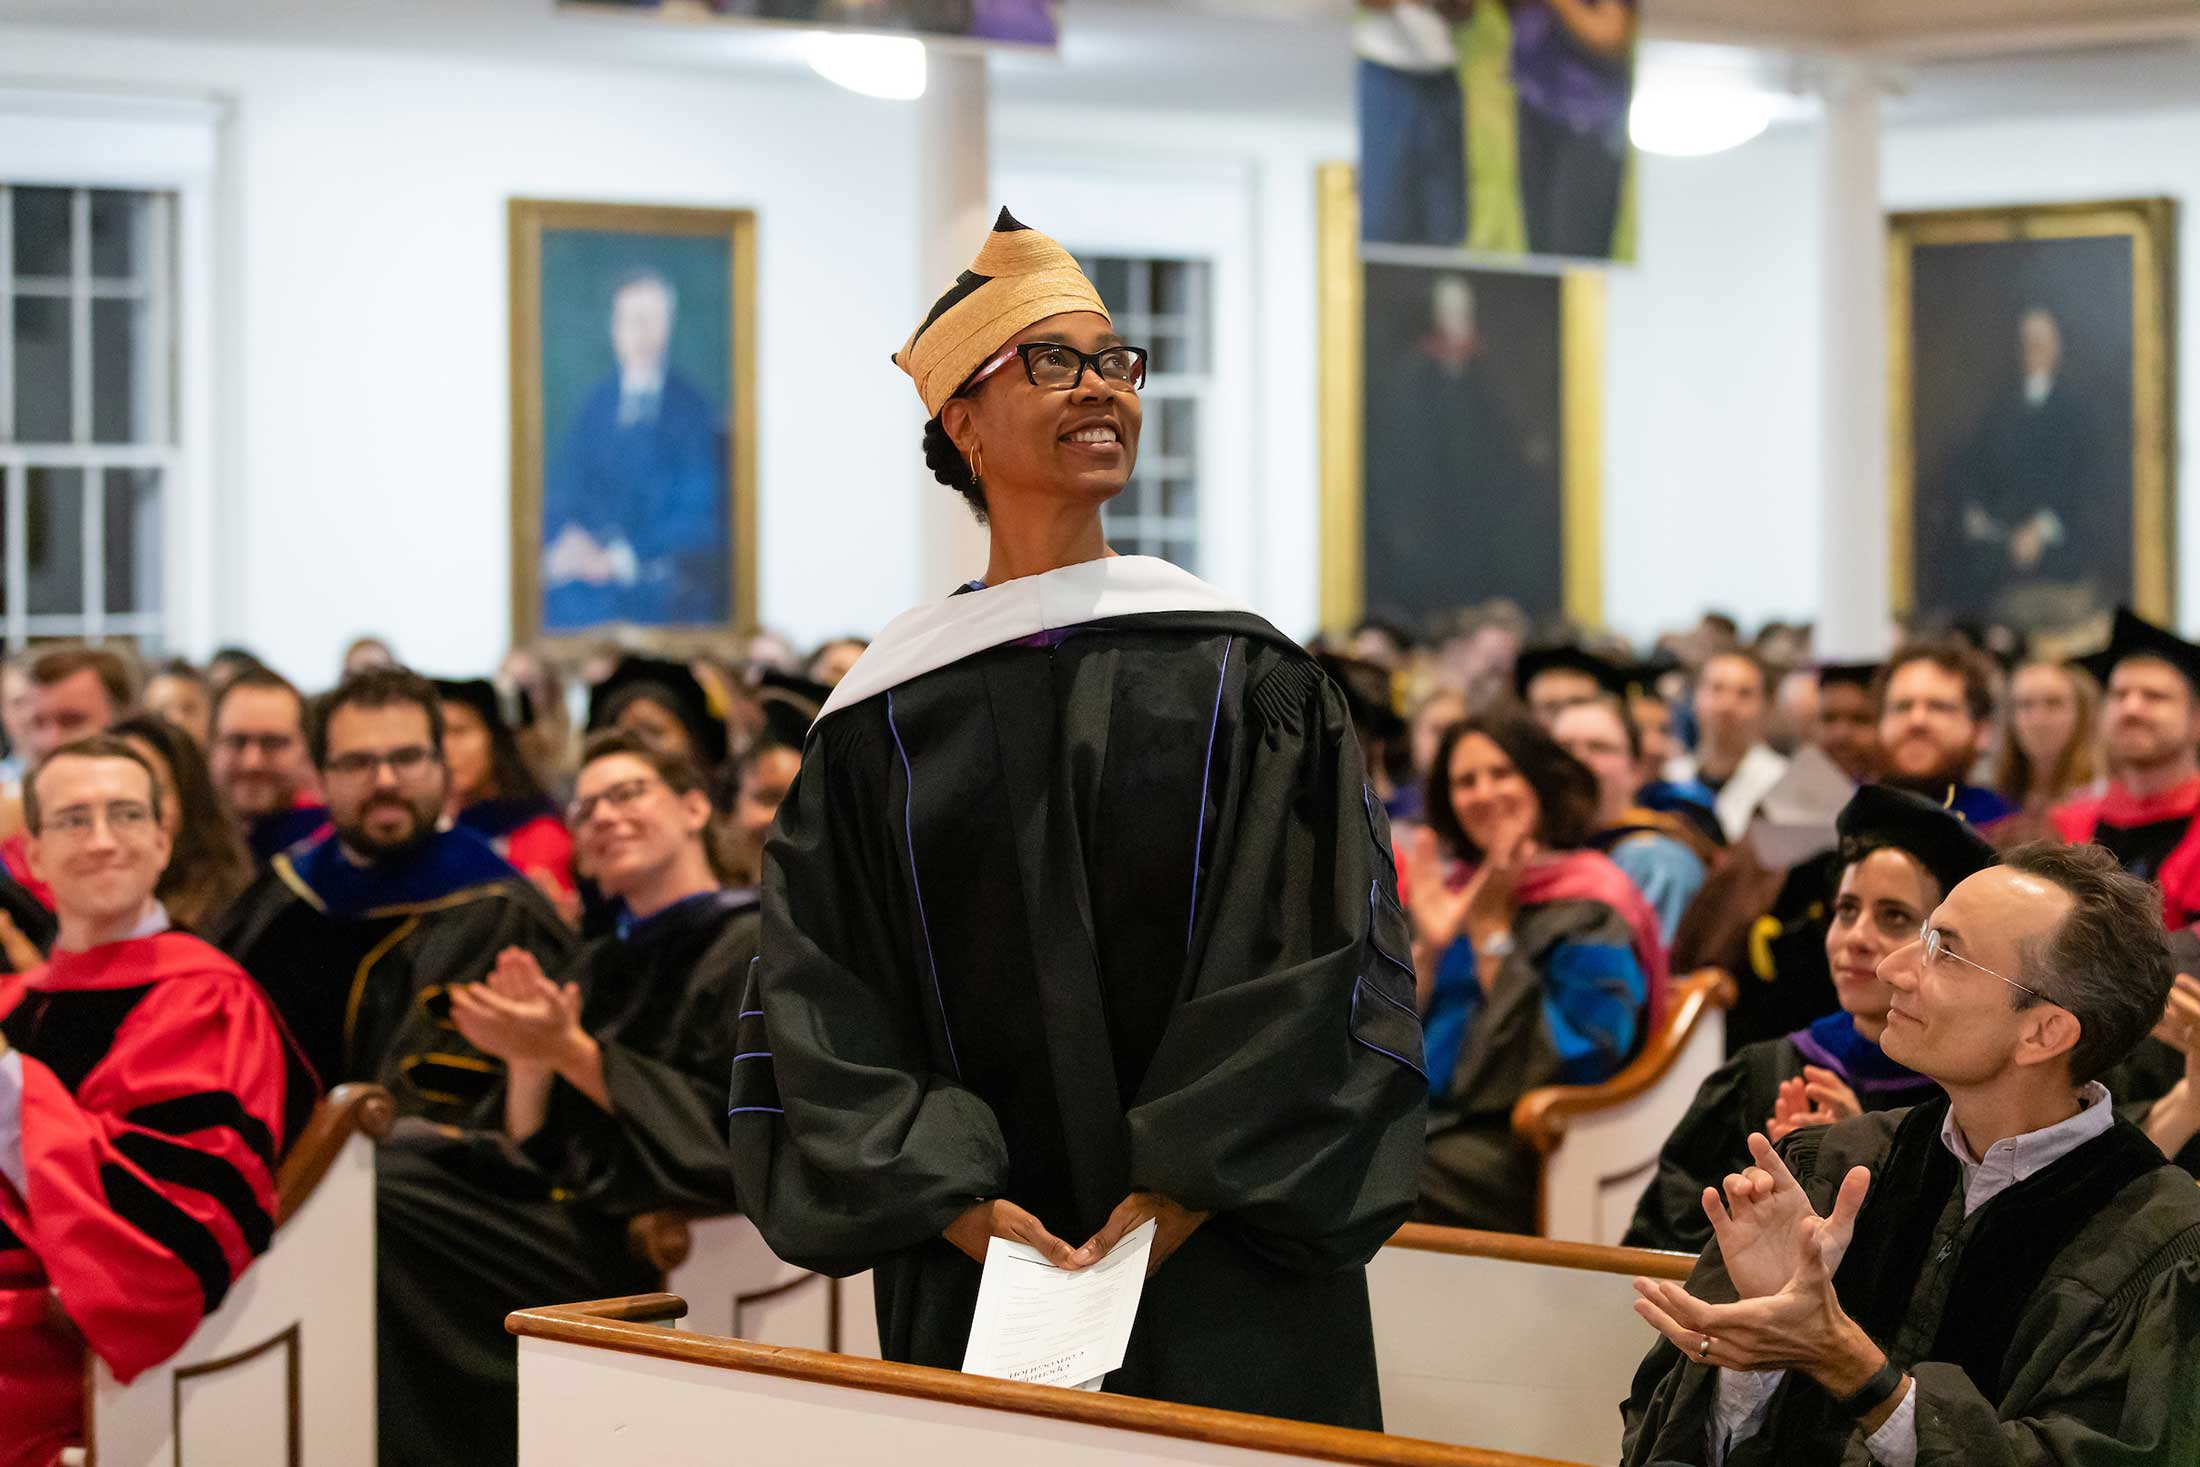 Professor Sonya Clark stands for recognition from her peers.